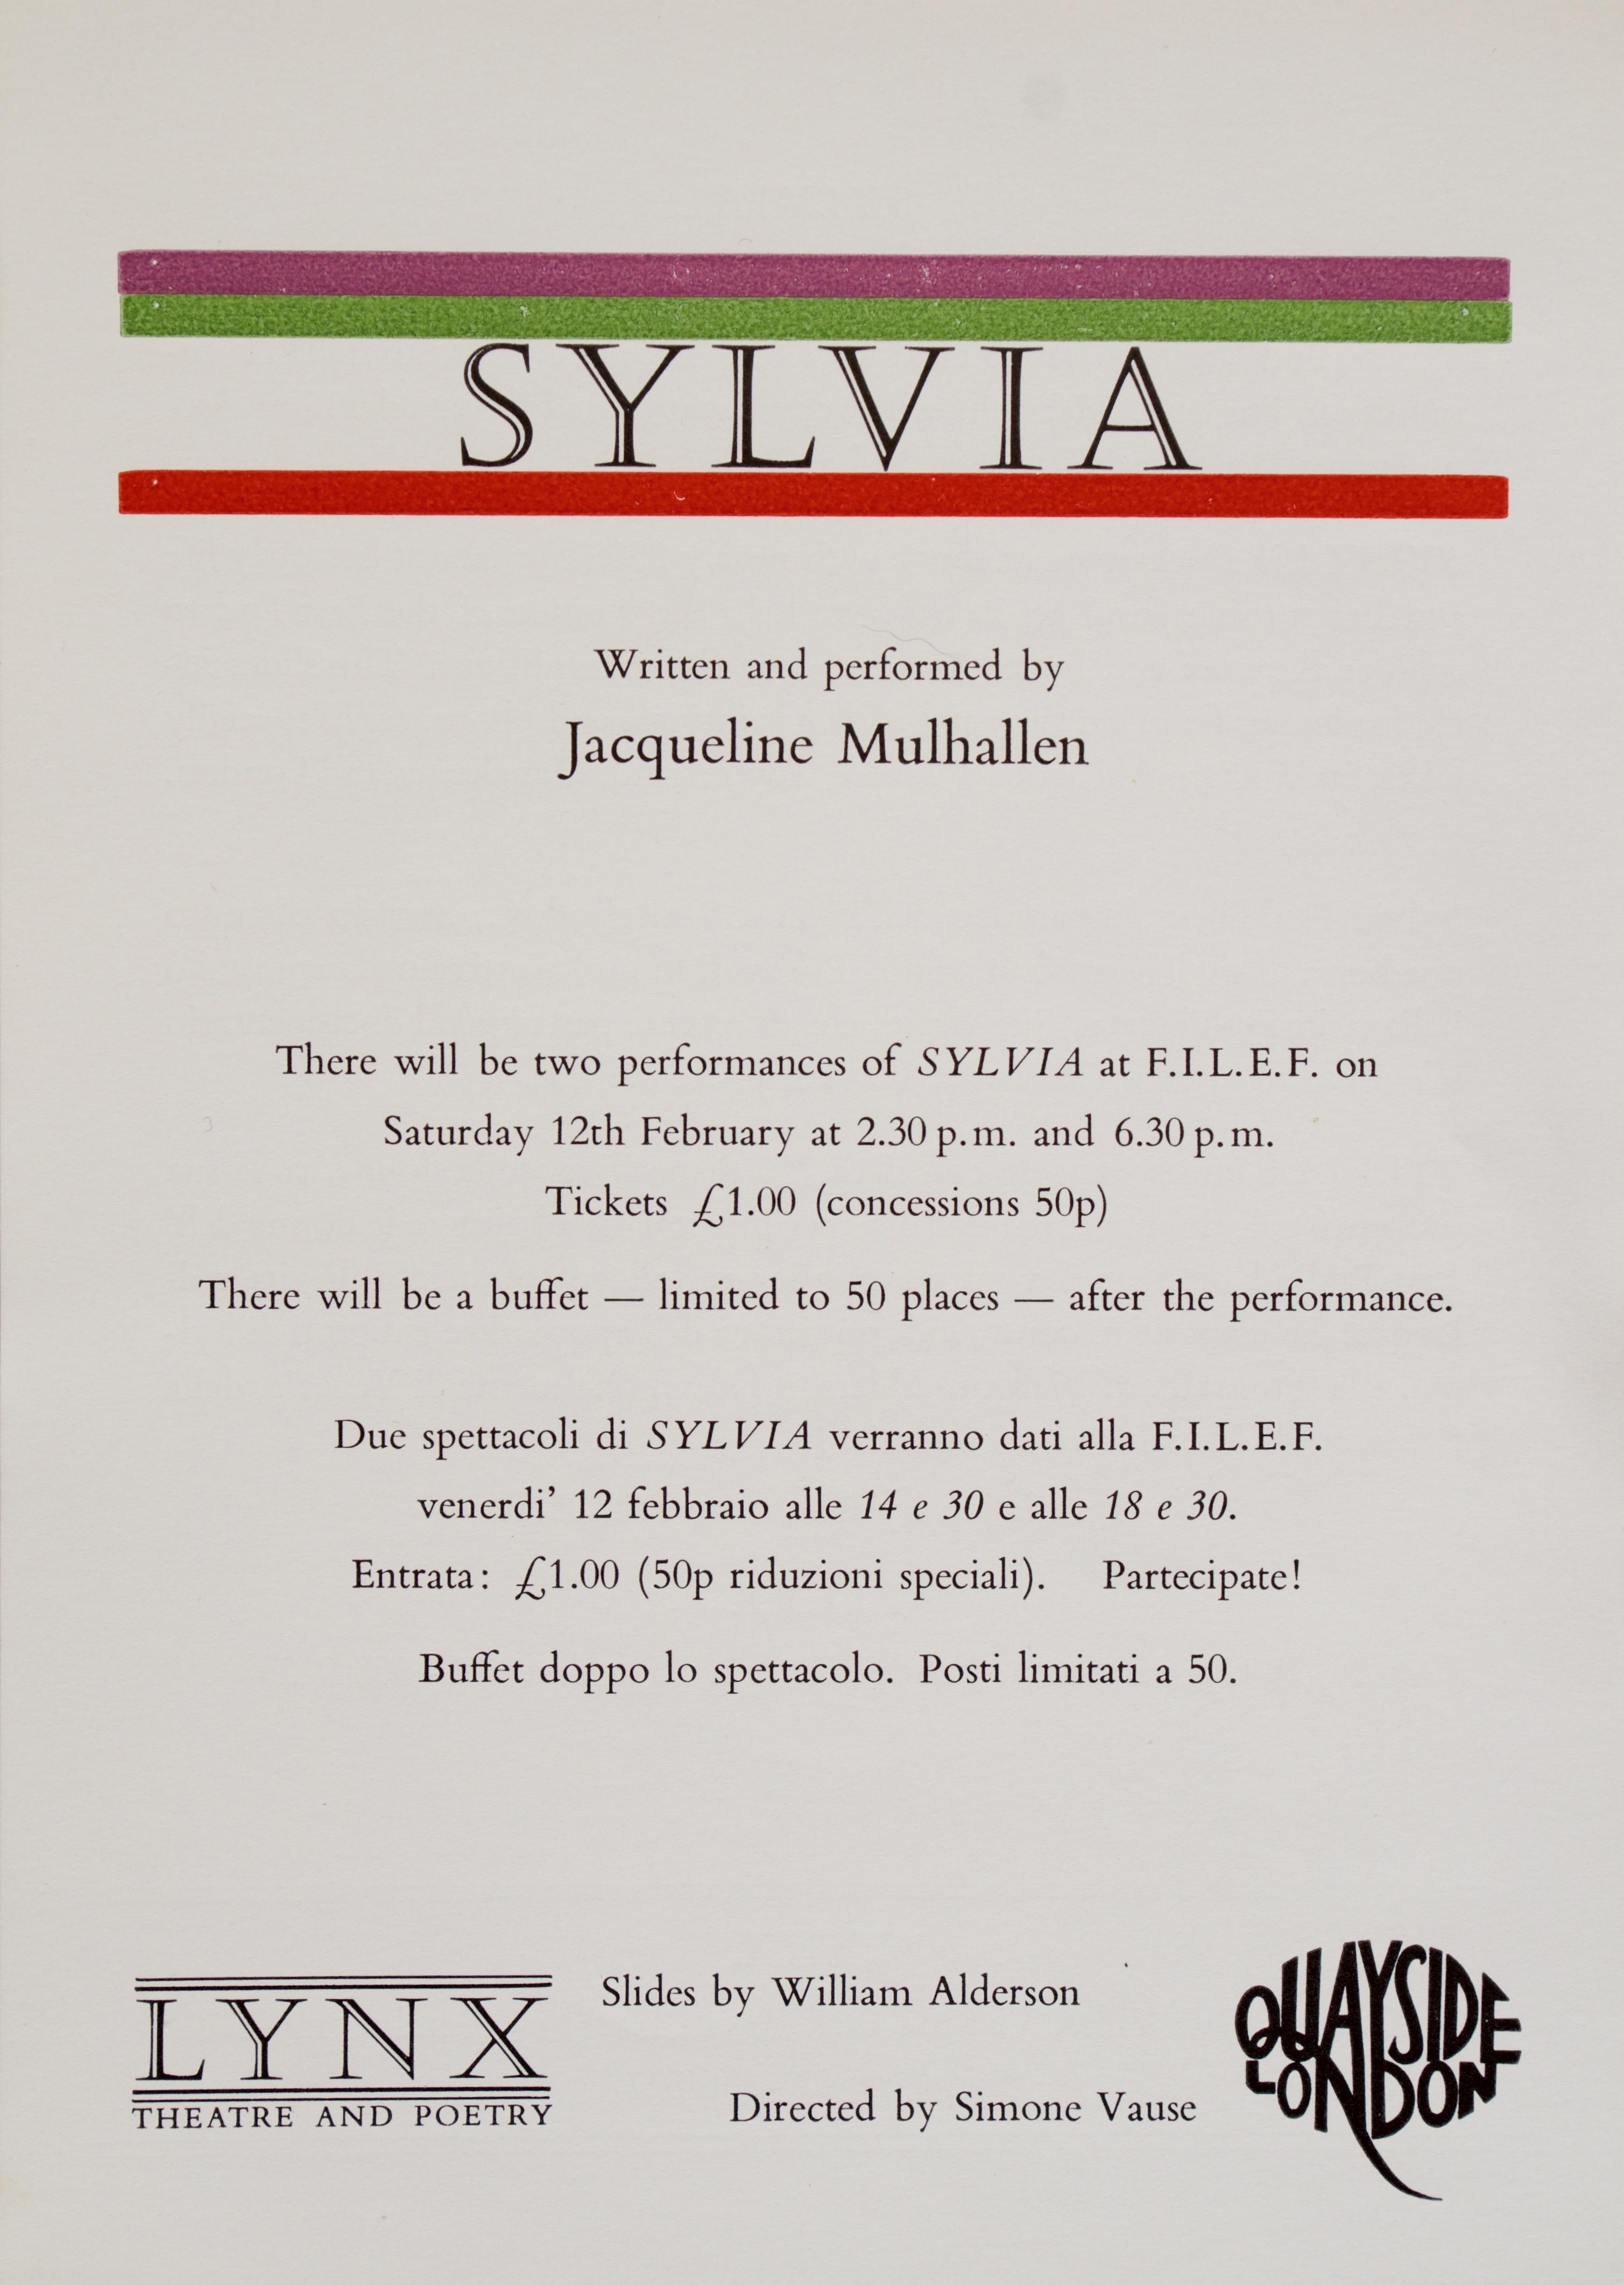 Sylvia leaflet 1988